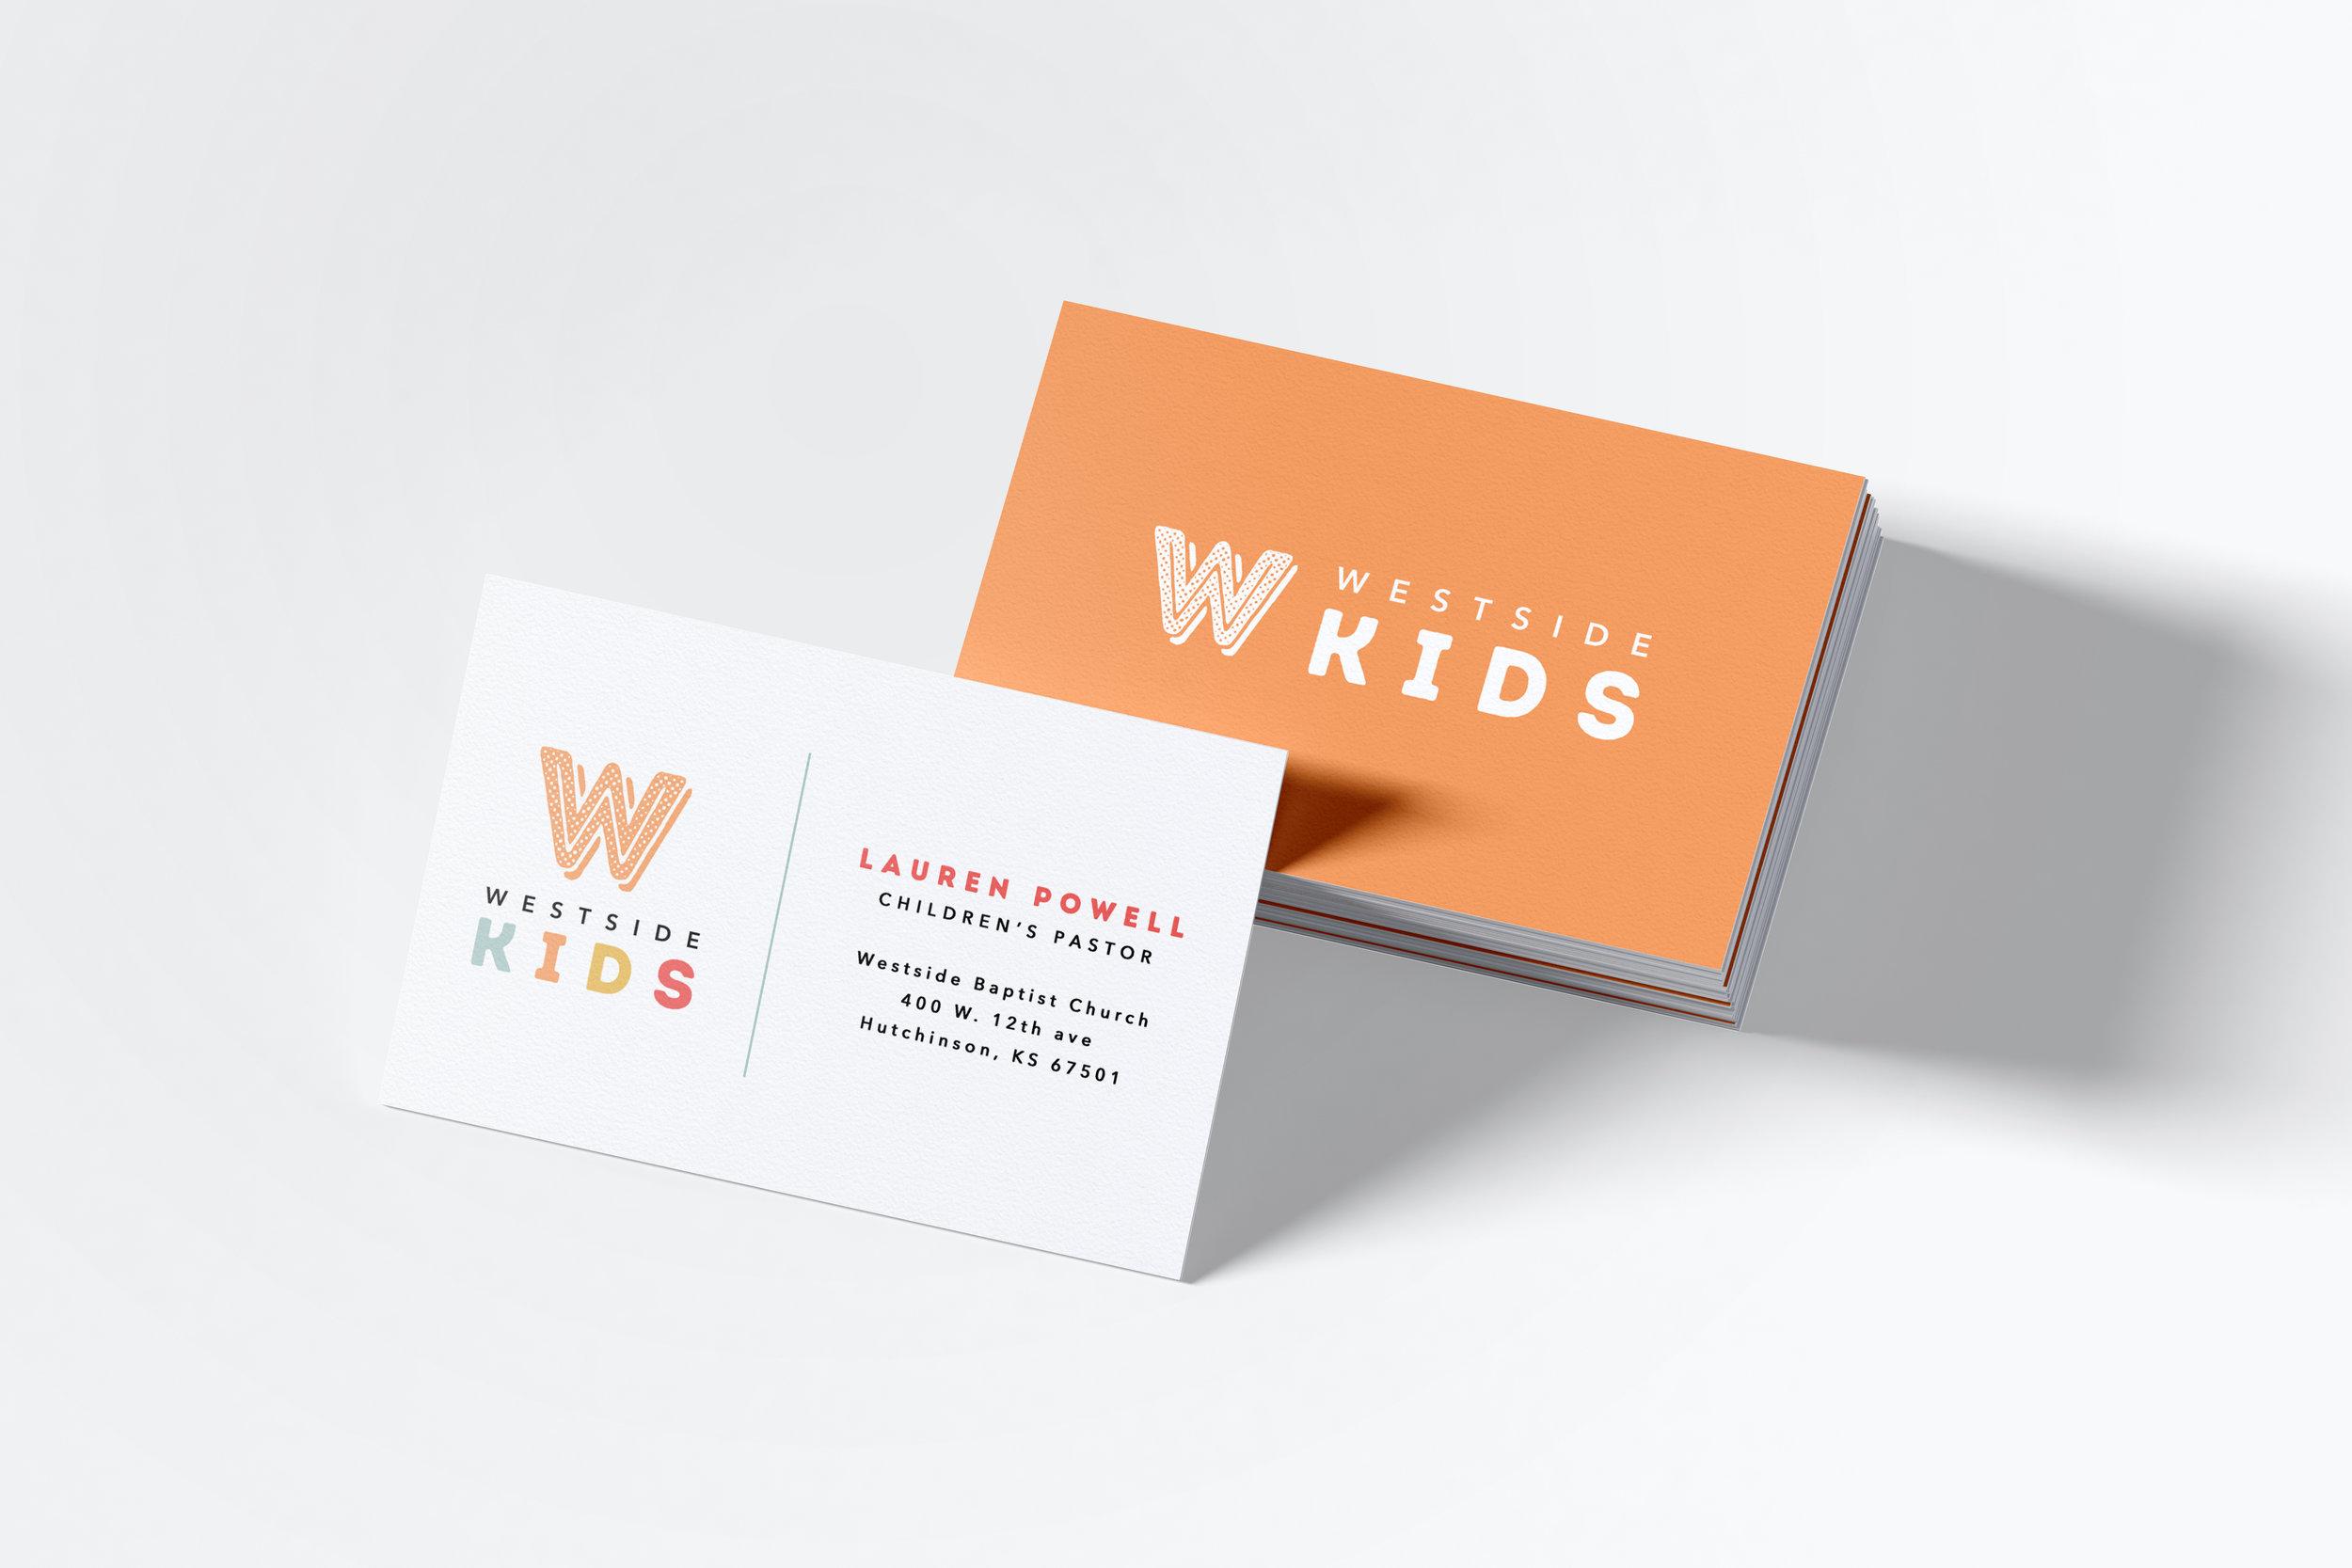 Westside_businesscard2.jpg